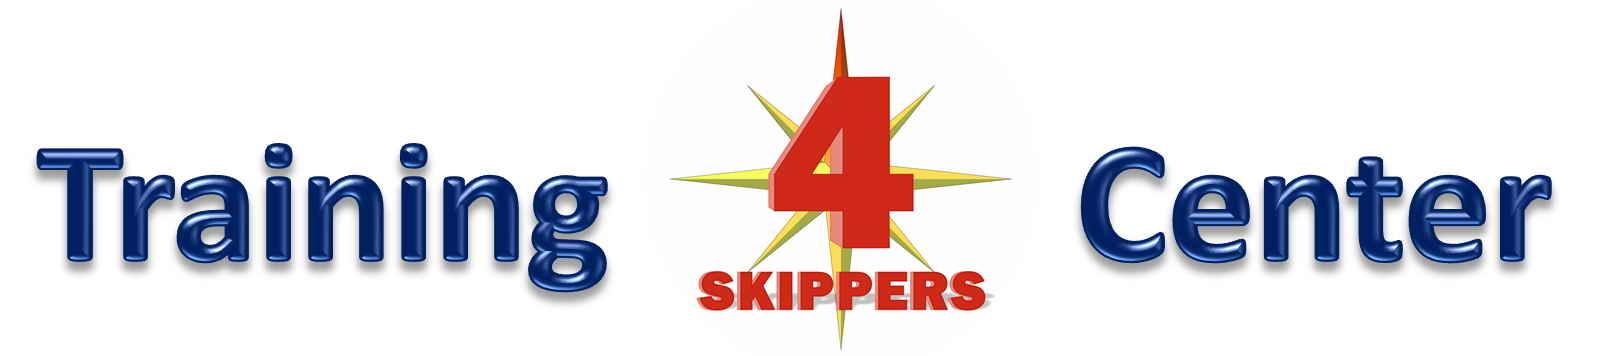 4skippers Тренинг-центр яхтенных капитанов